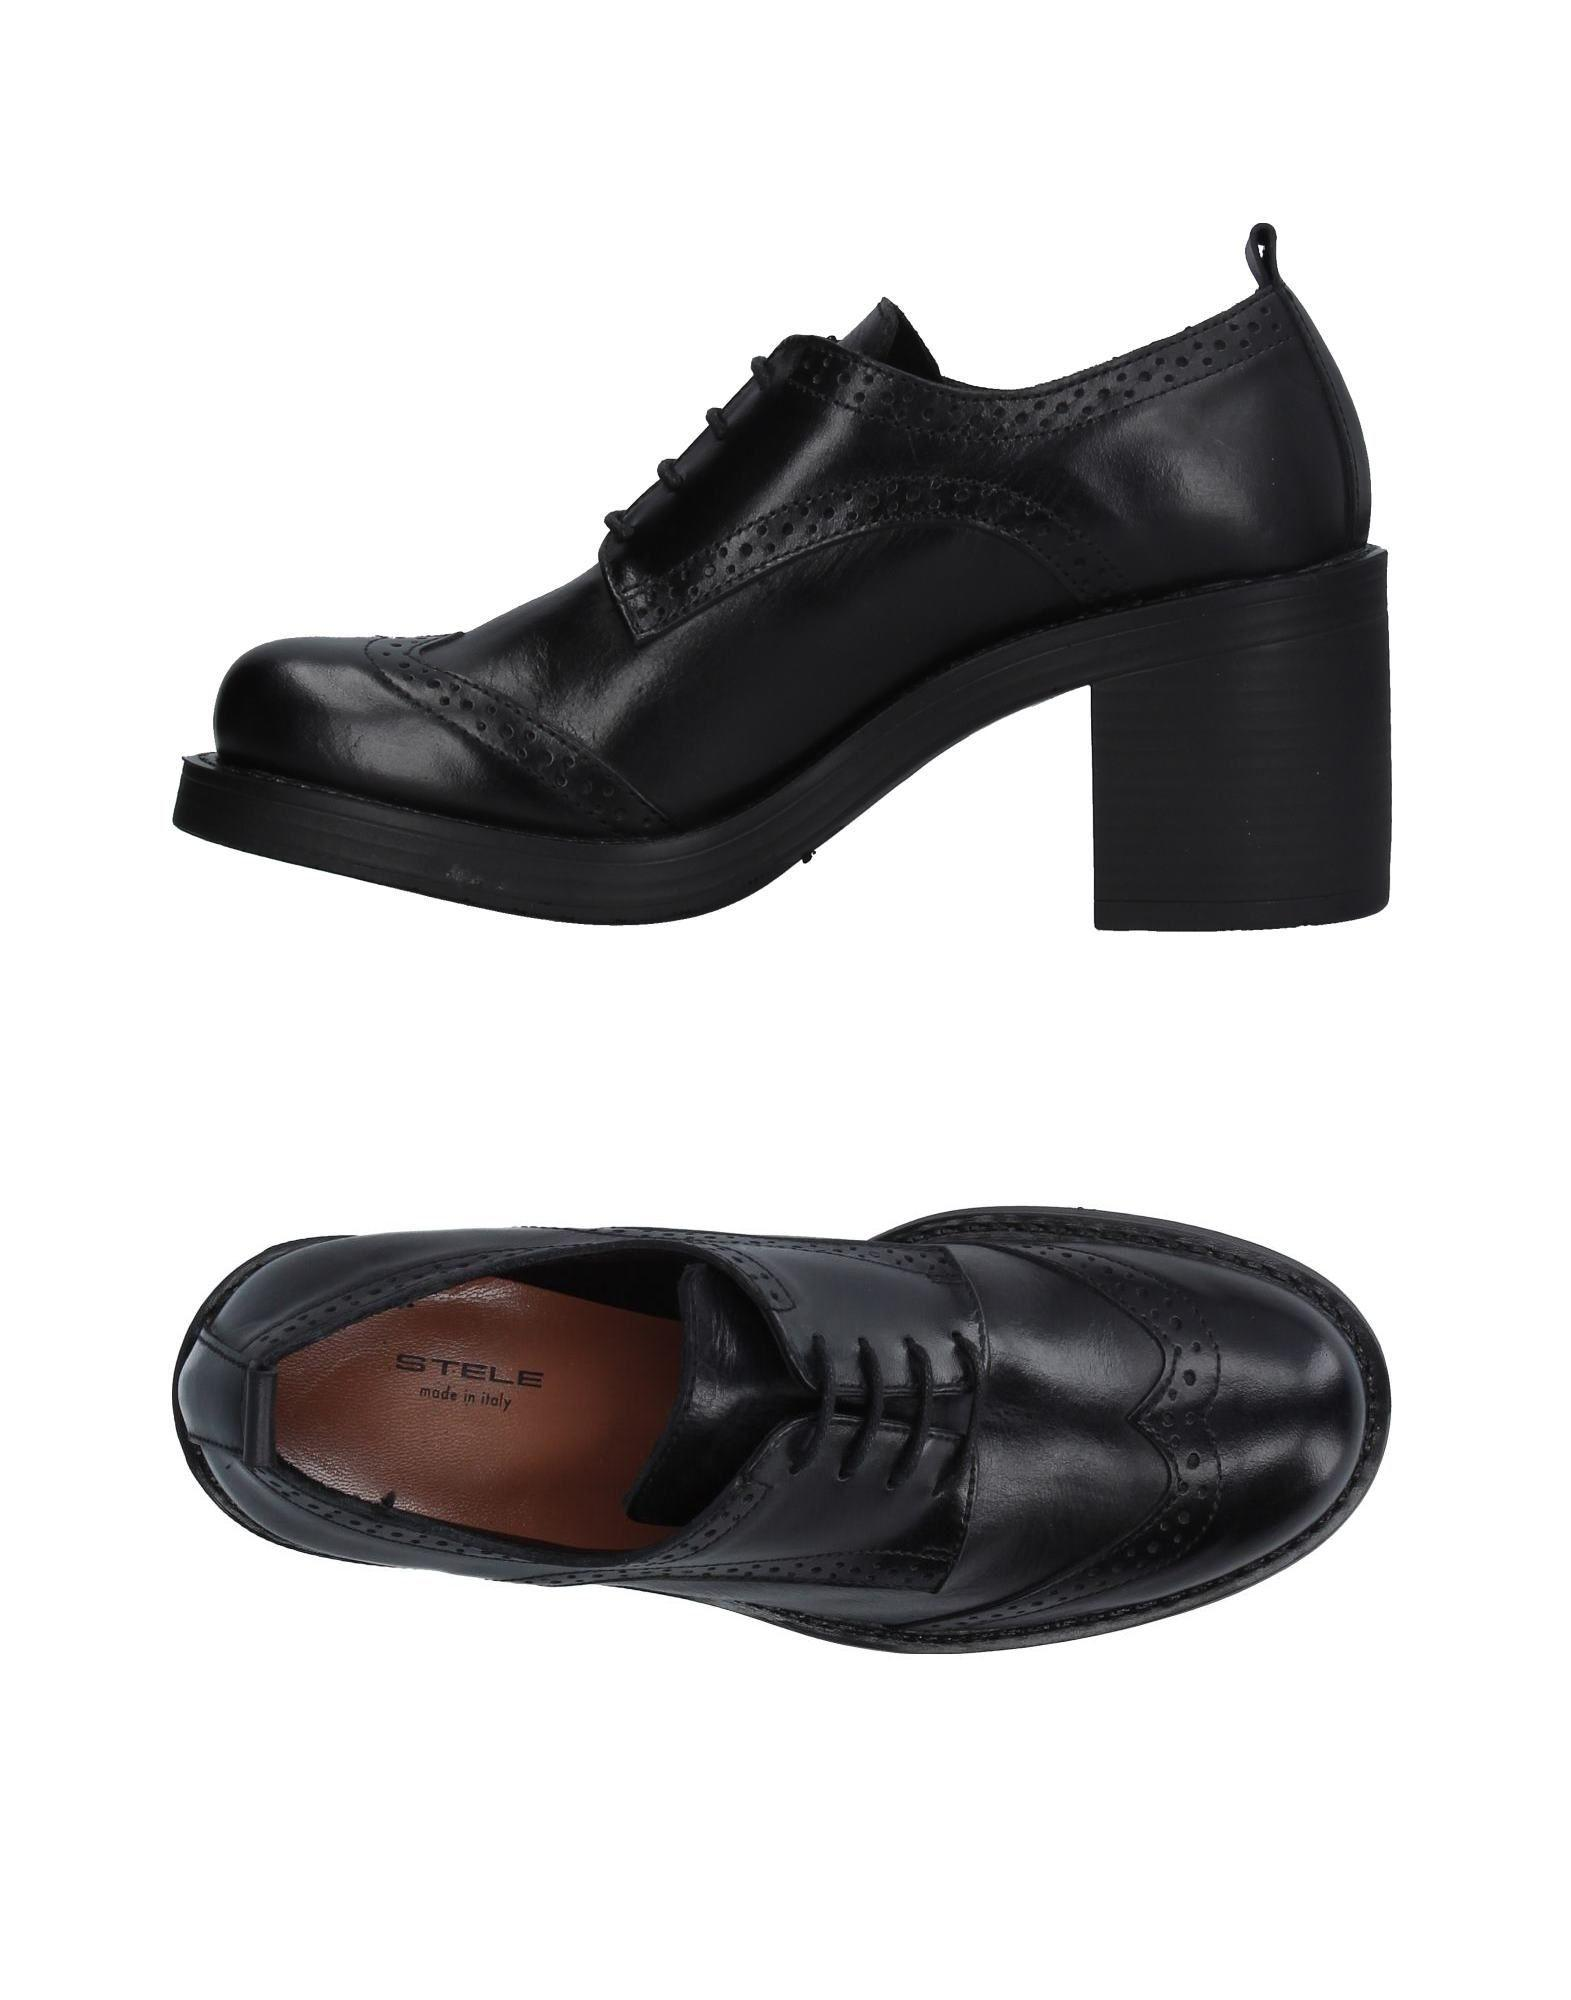 FOOTWEAR - Lace-up shoes Stele oCgYlvG